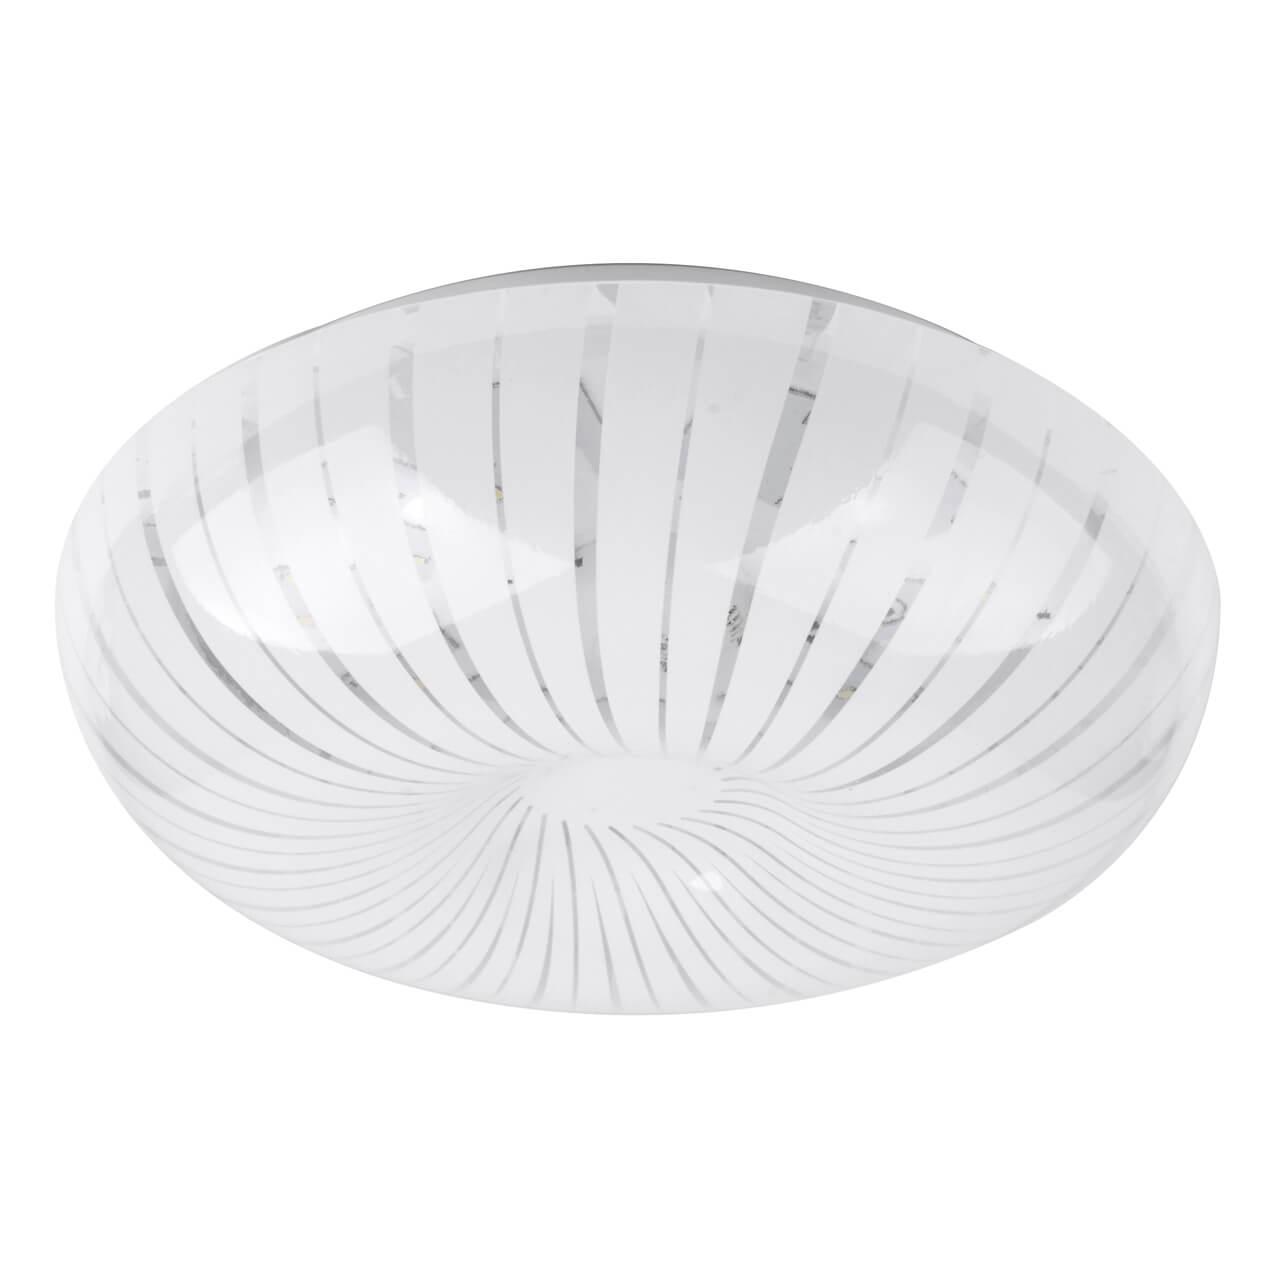 Светильник ЭРА SPB-6-24-6,5K (A) Медуза